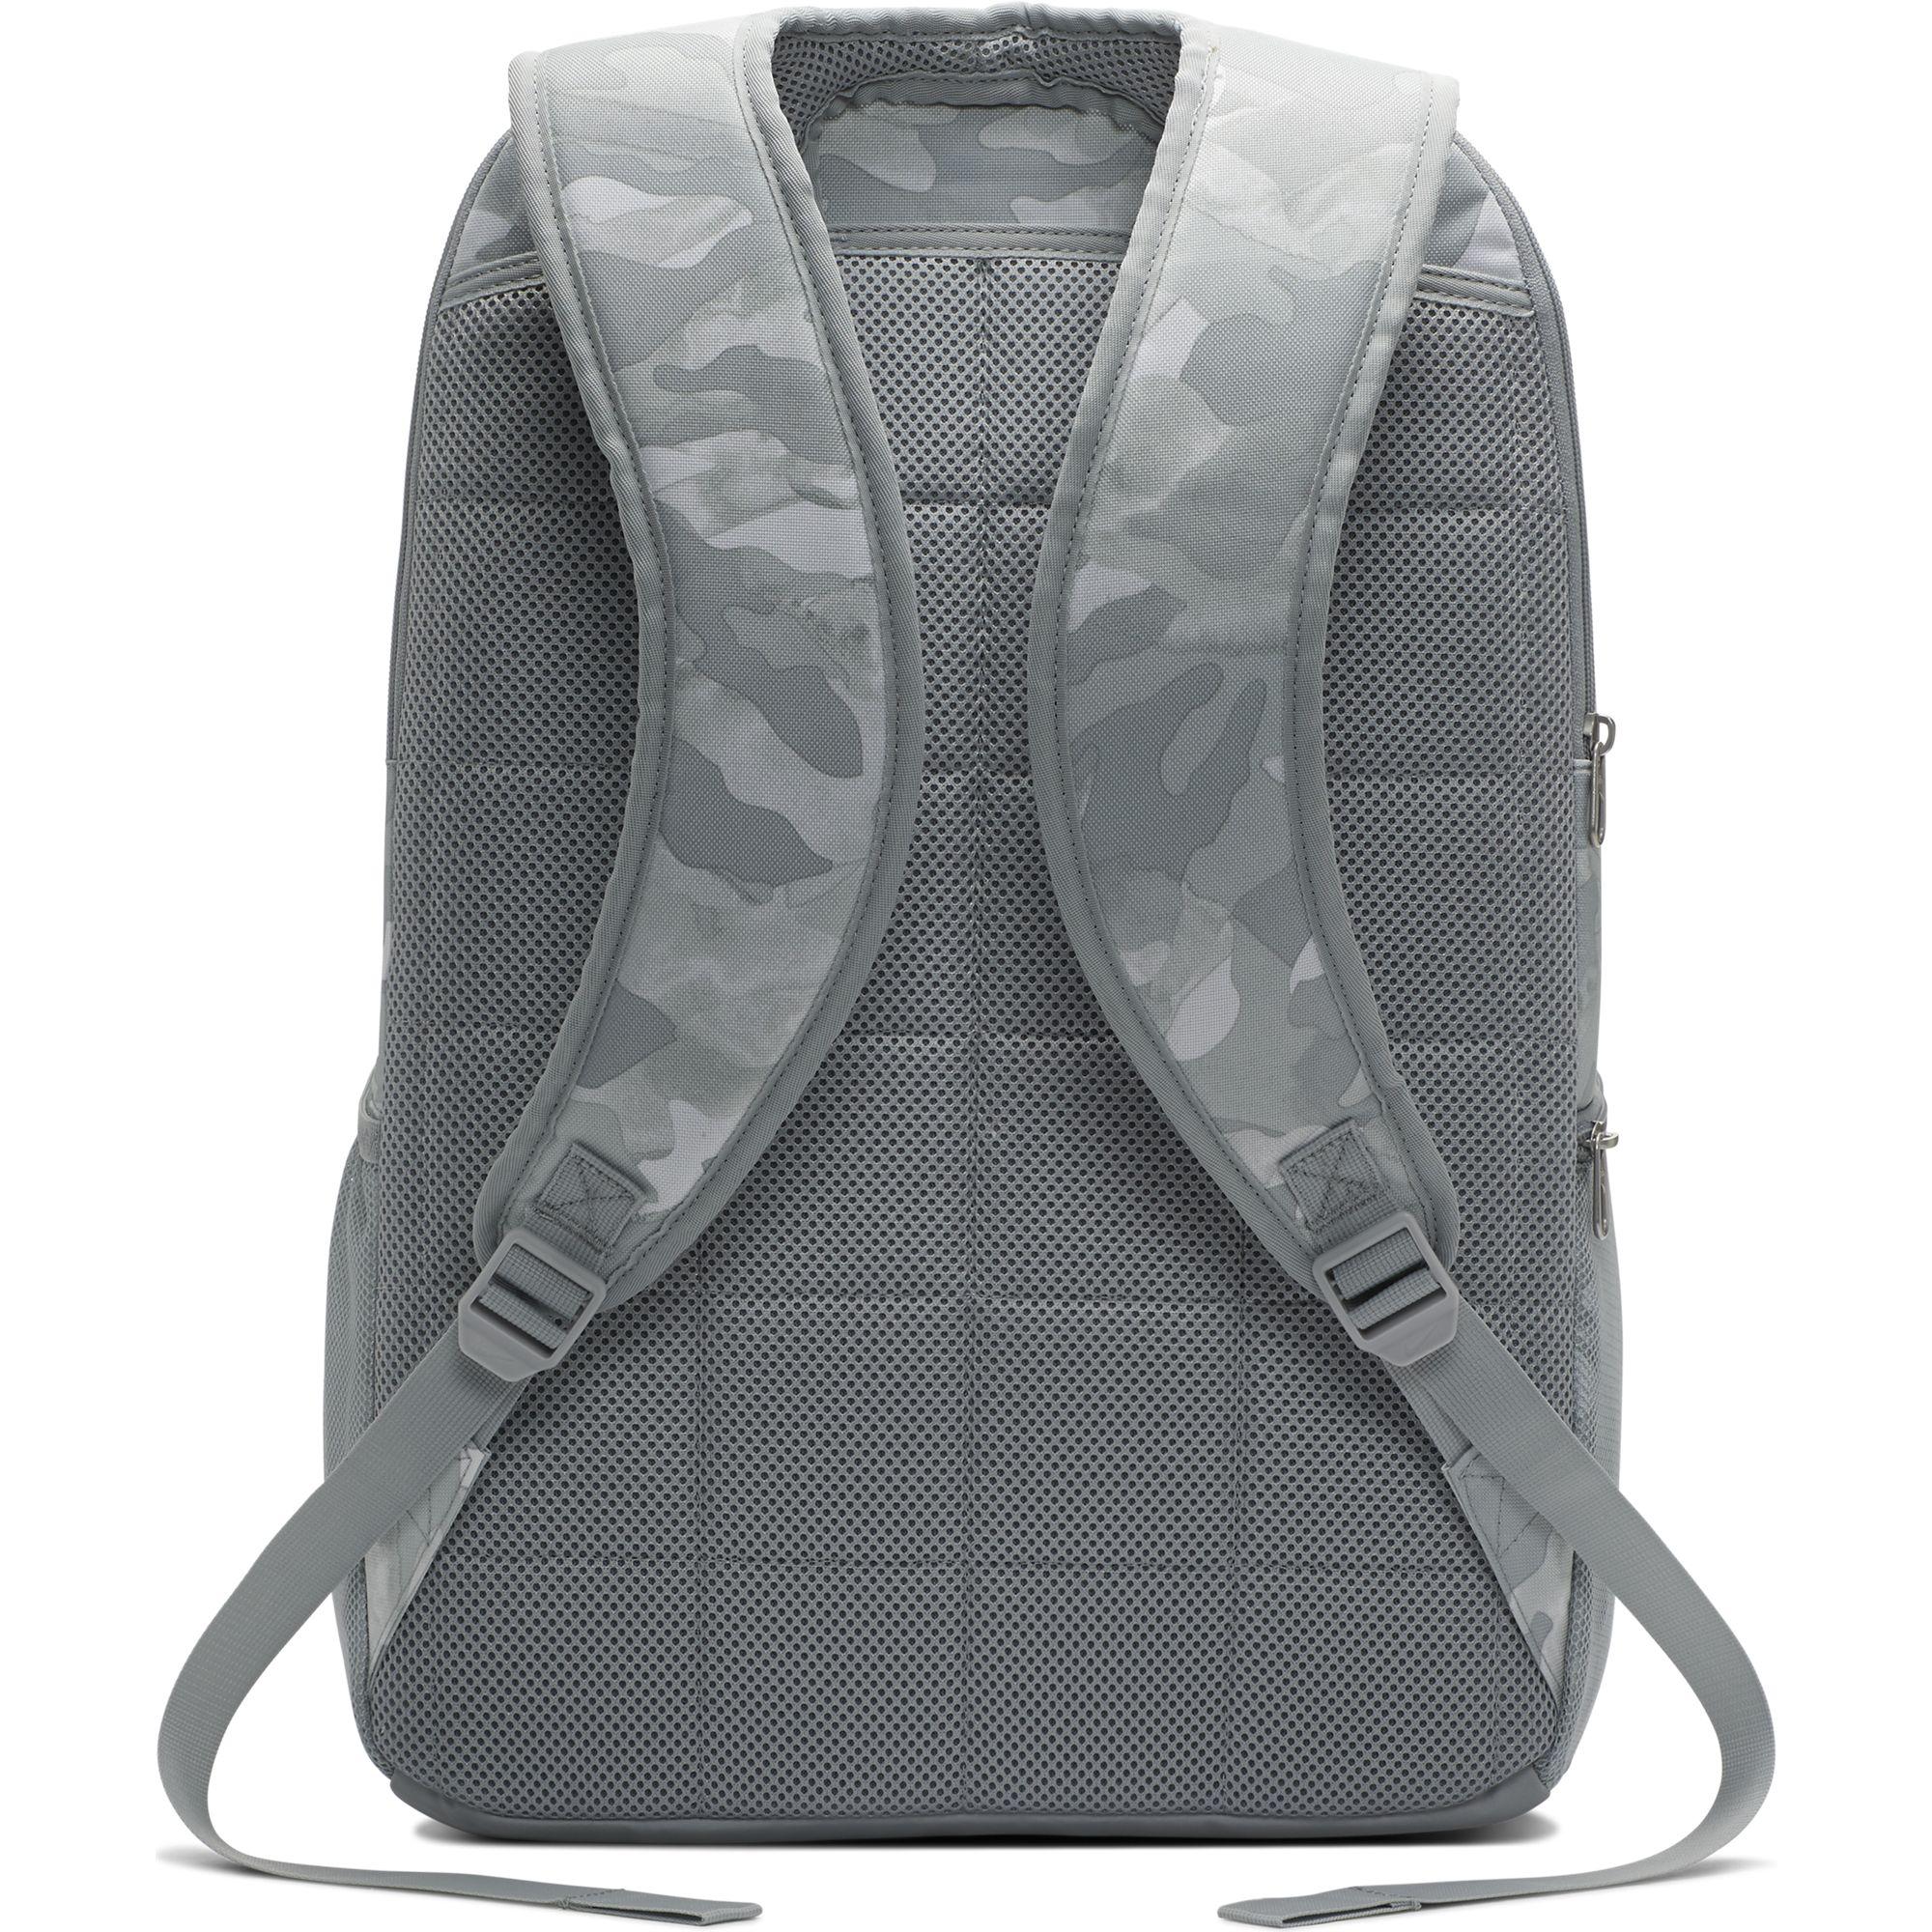 Brasilia XL Backpack, White/Gray, swatch